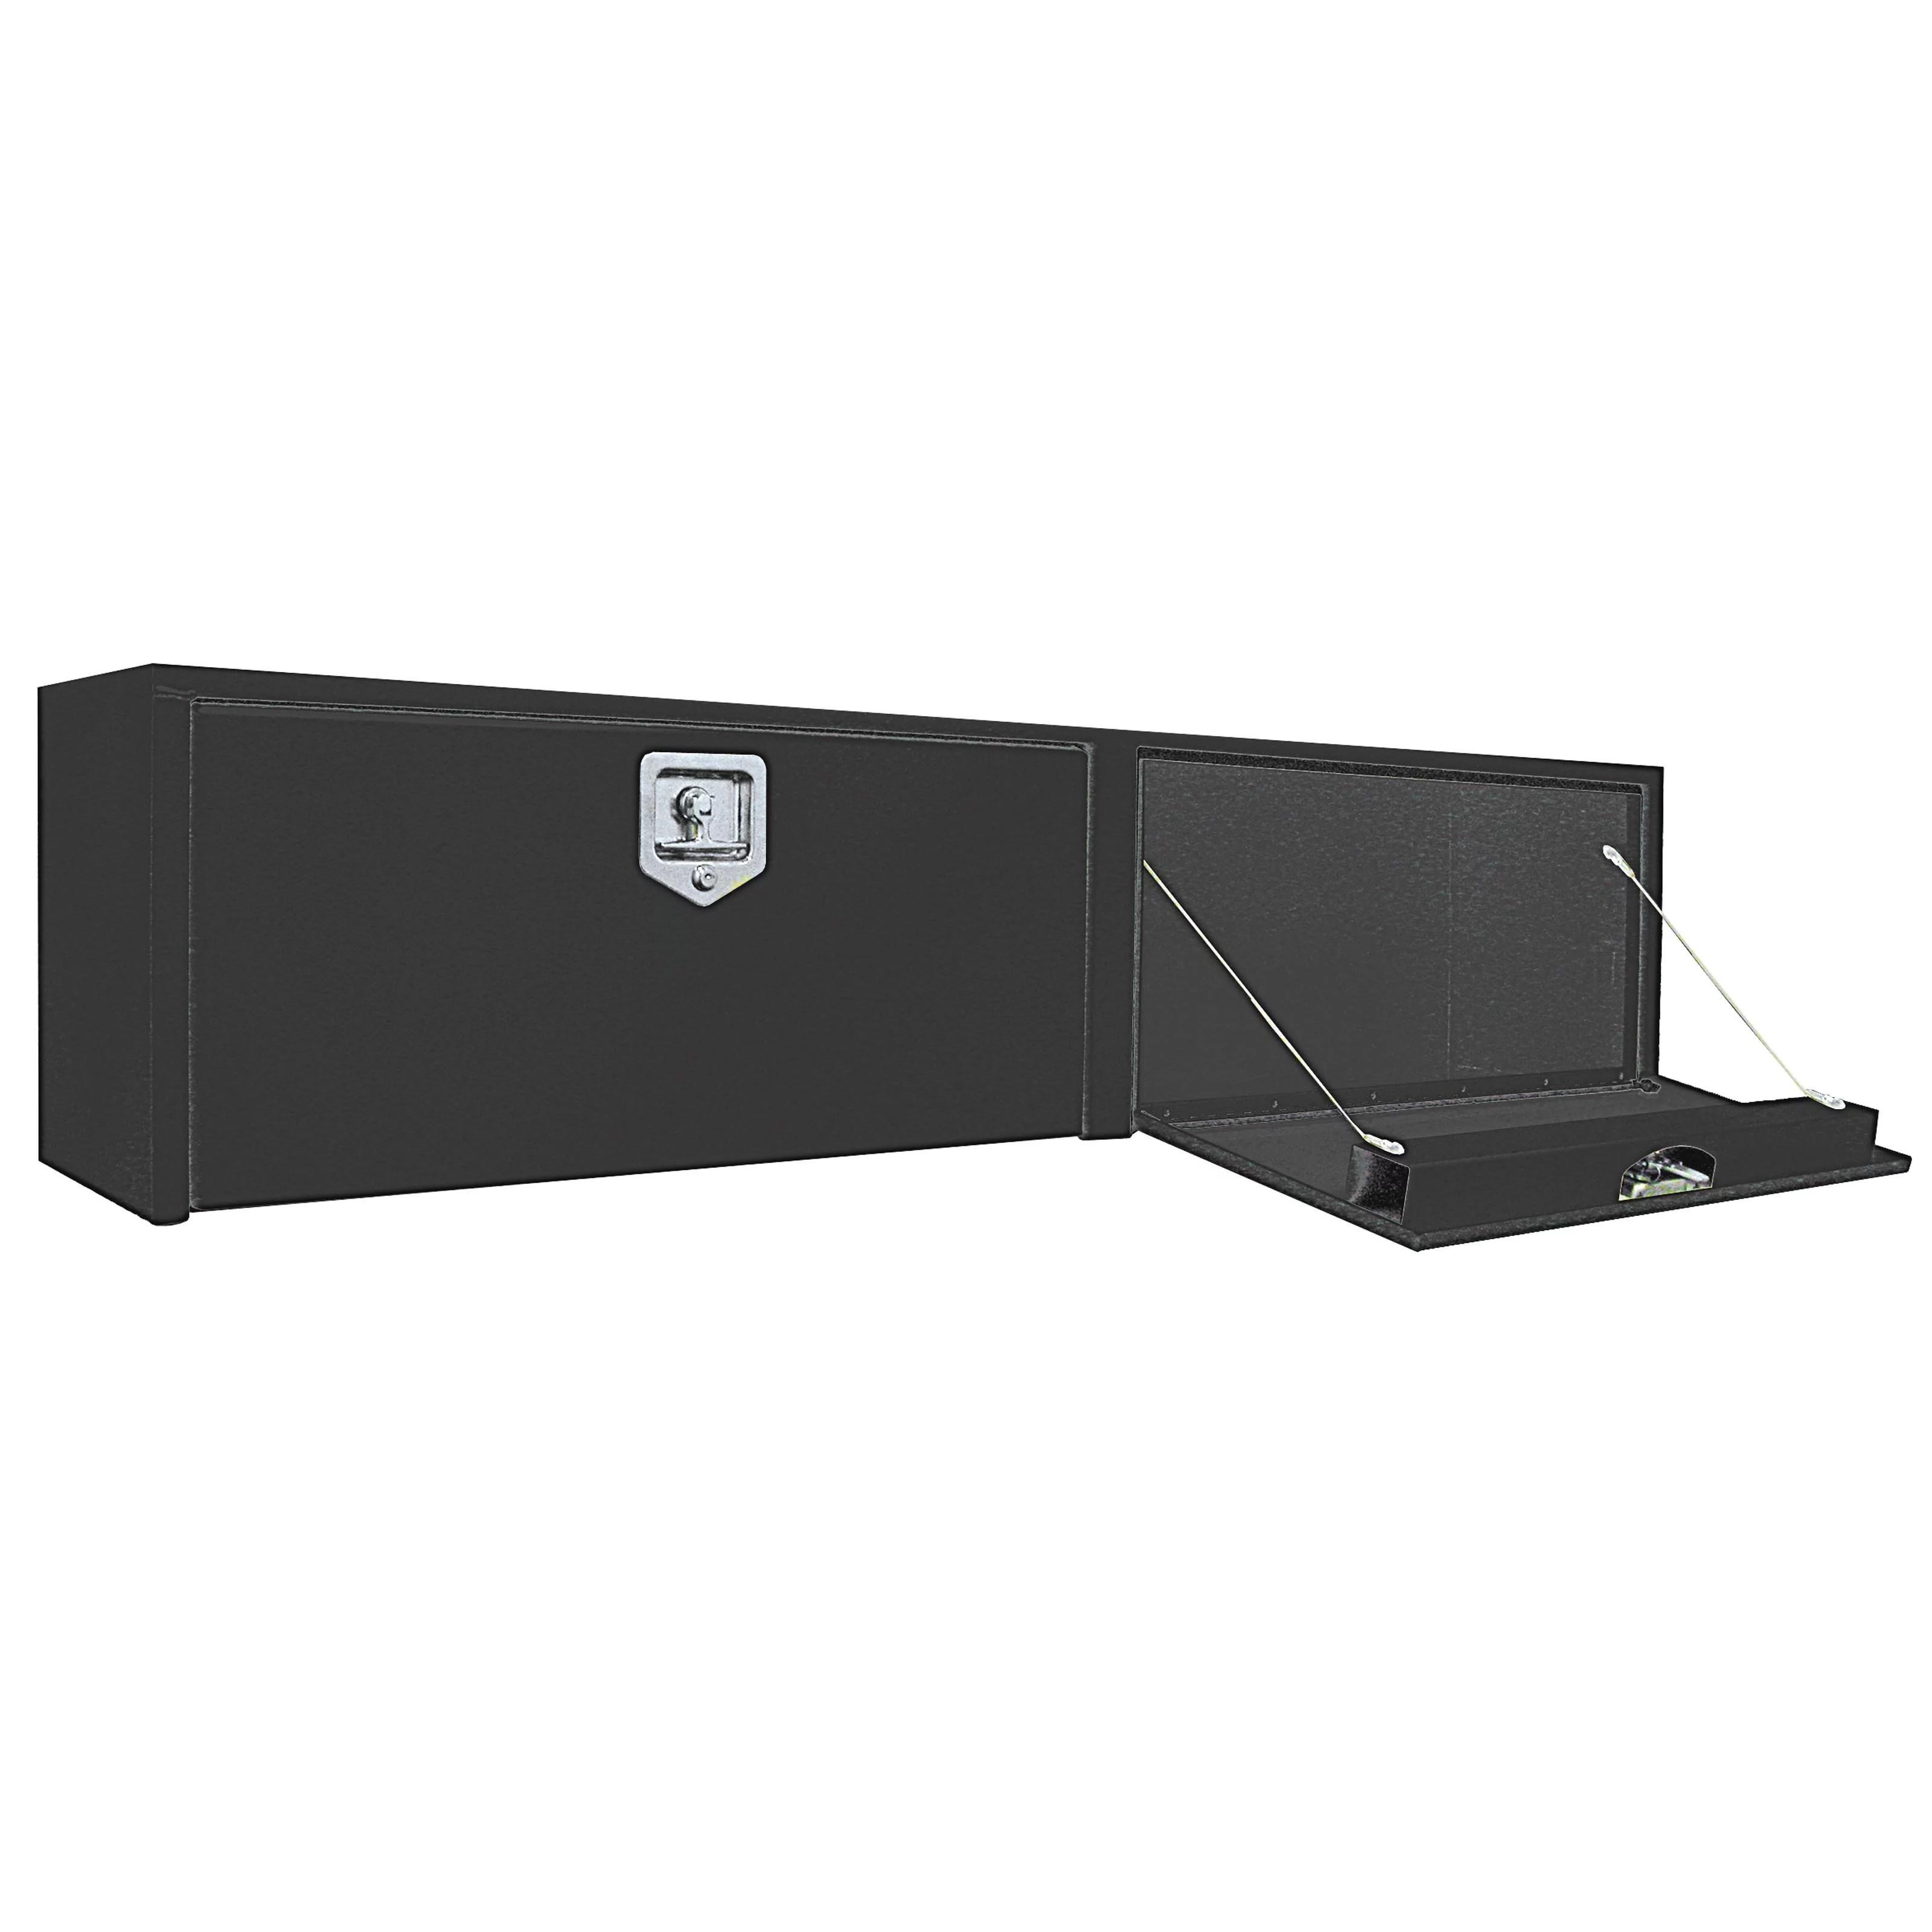 Buyers Steel Topside Tool Box Walmartcom